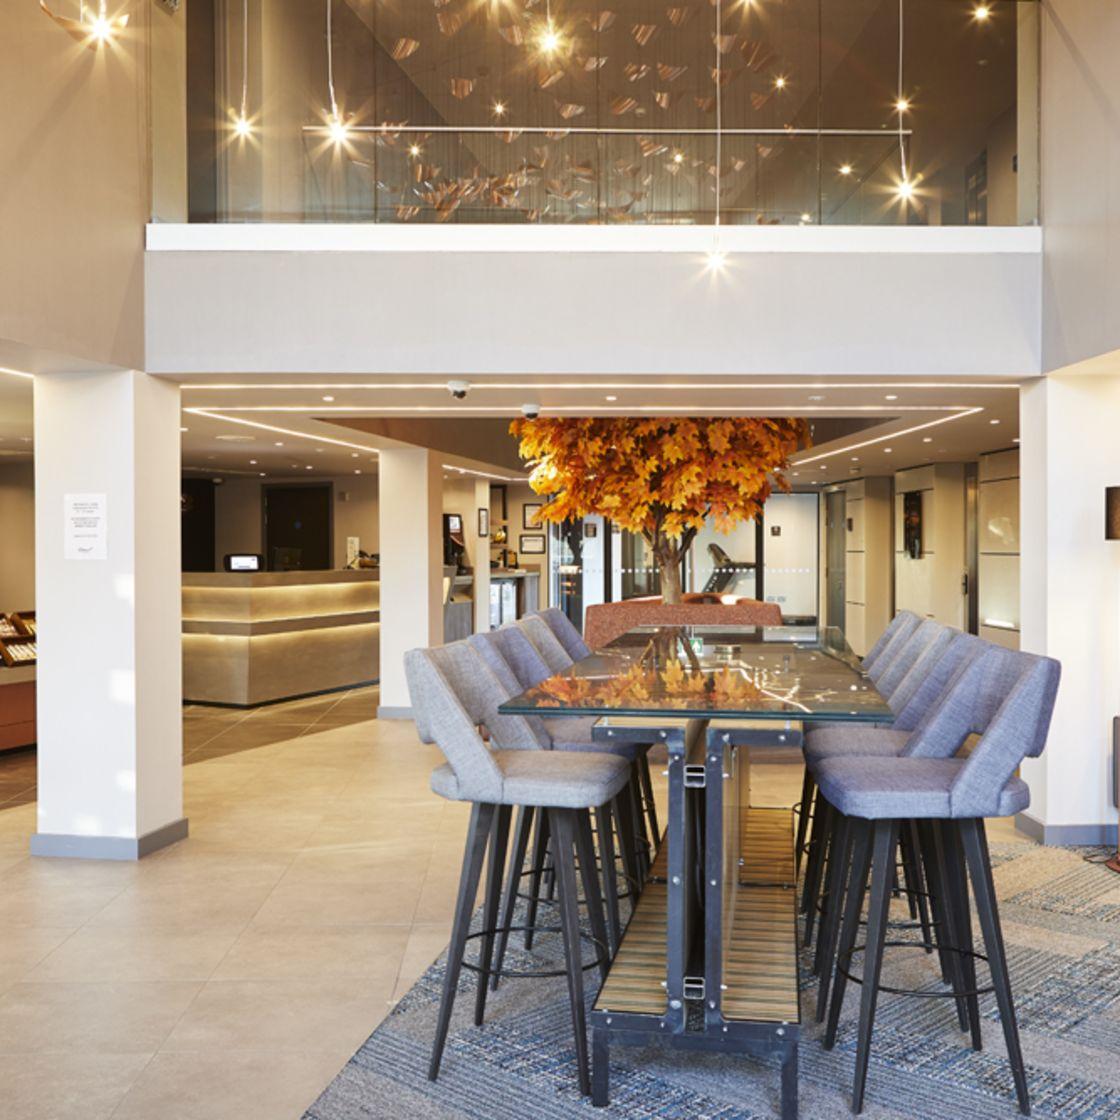 IconInc @ Roomzzz York City Reception Lounge. Student Accommodation in York